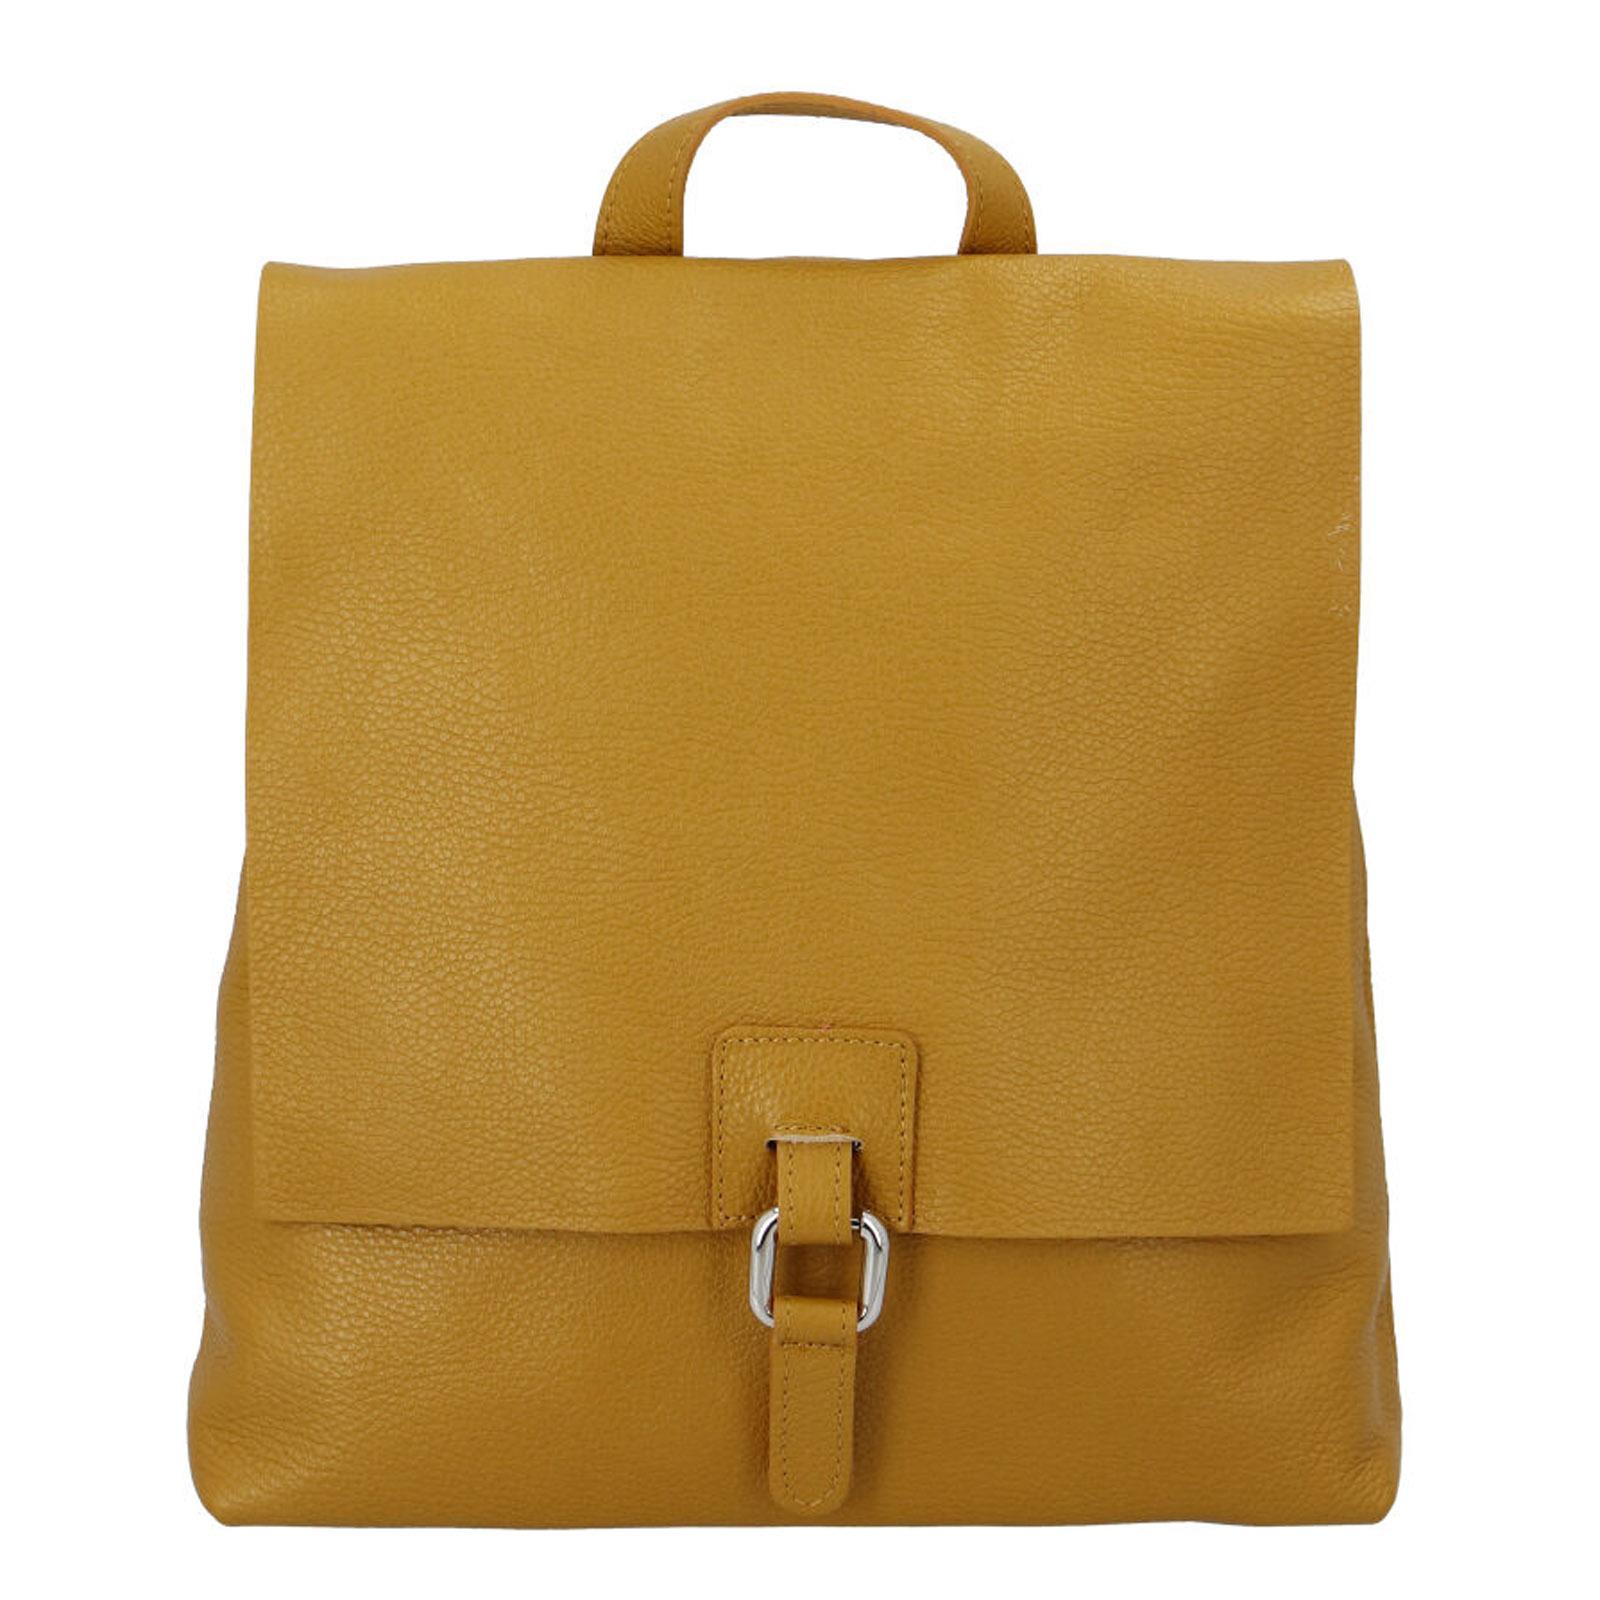 Dámský kožený batůžek kabelka žlutý - ItalY Francesco